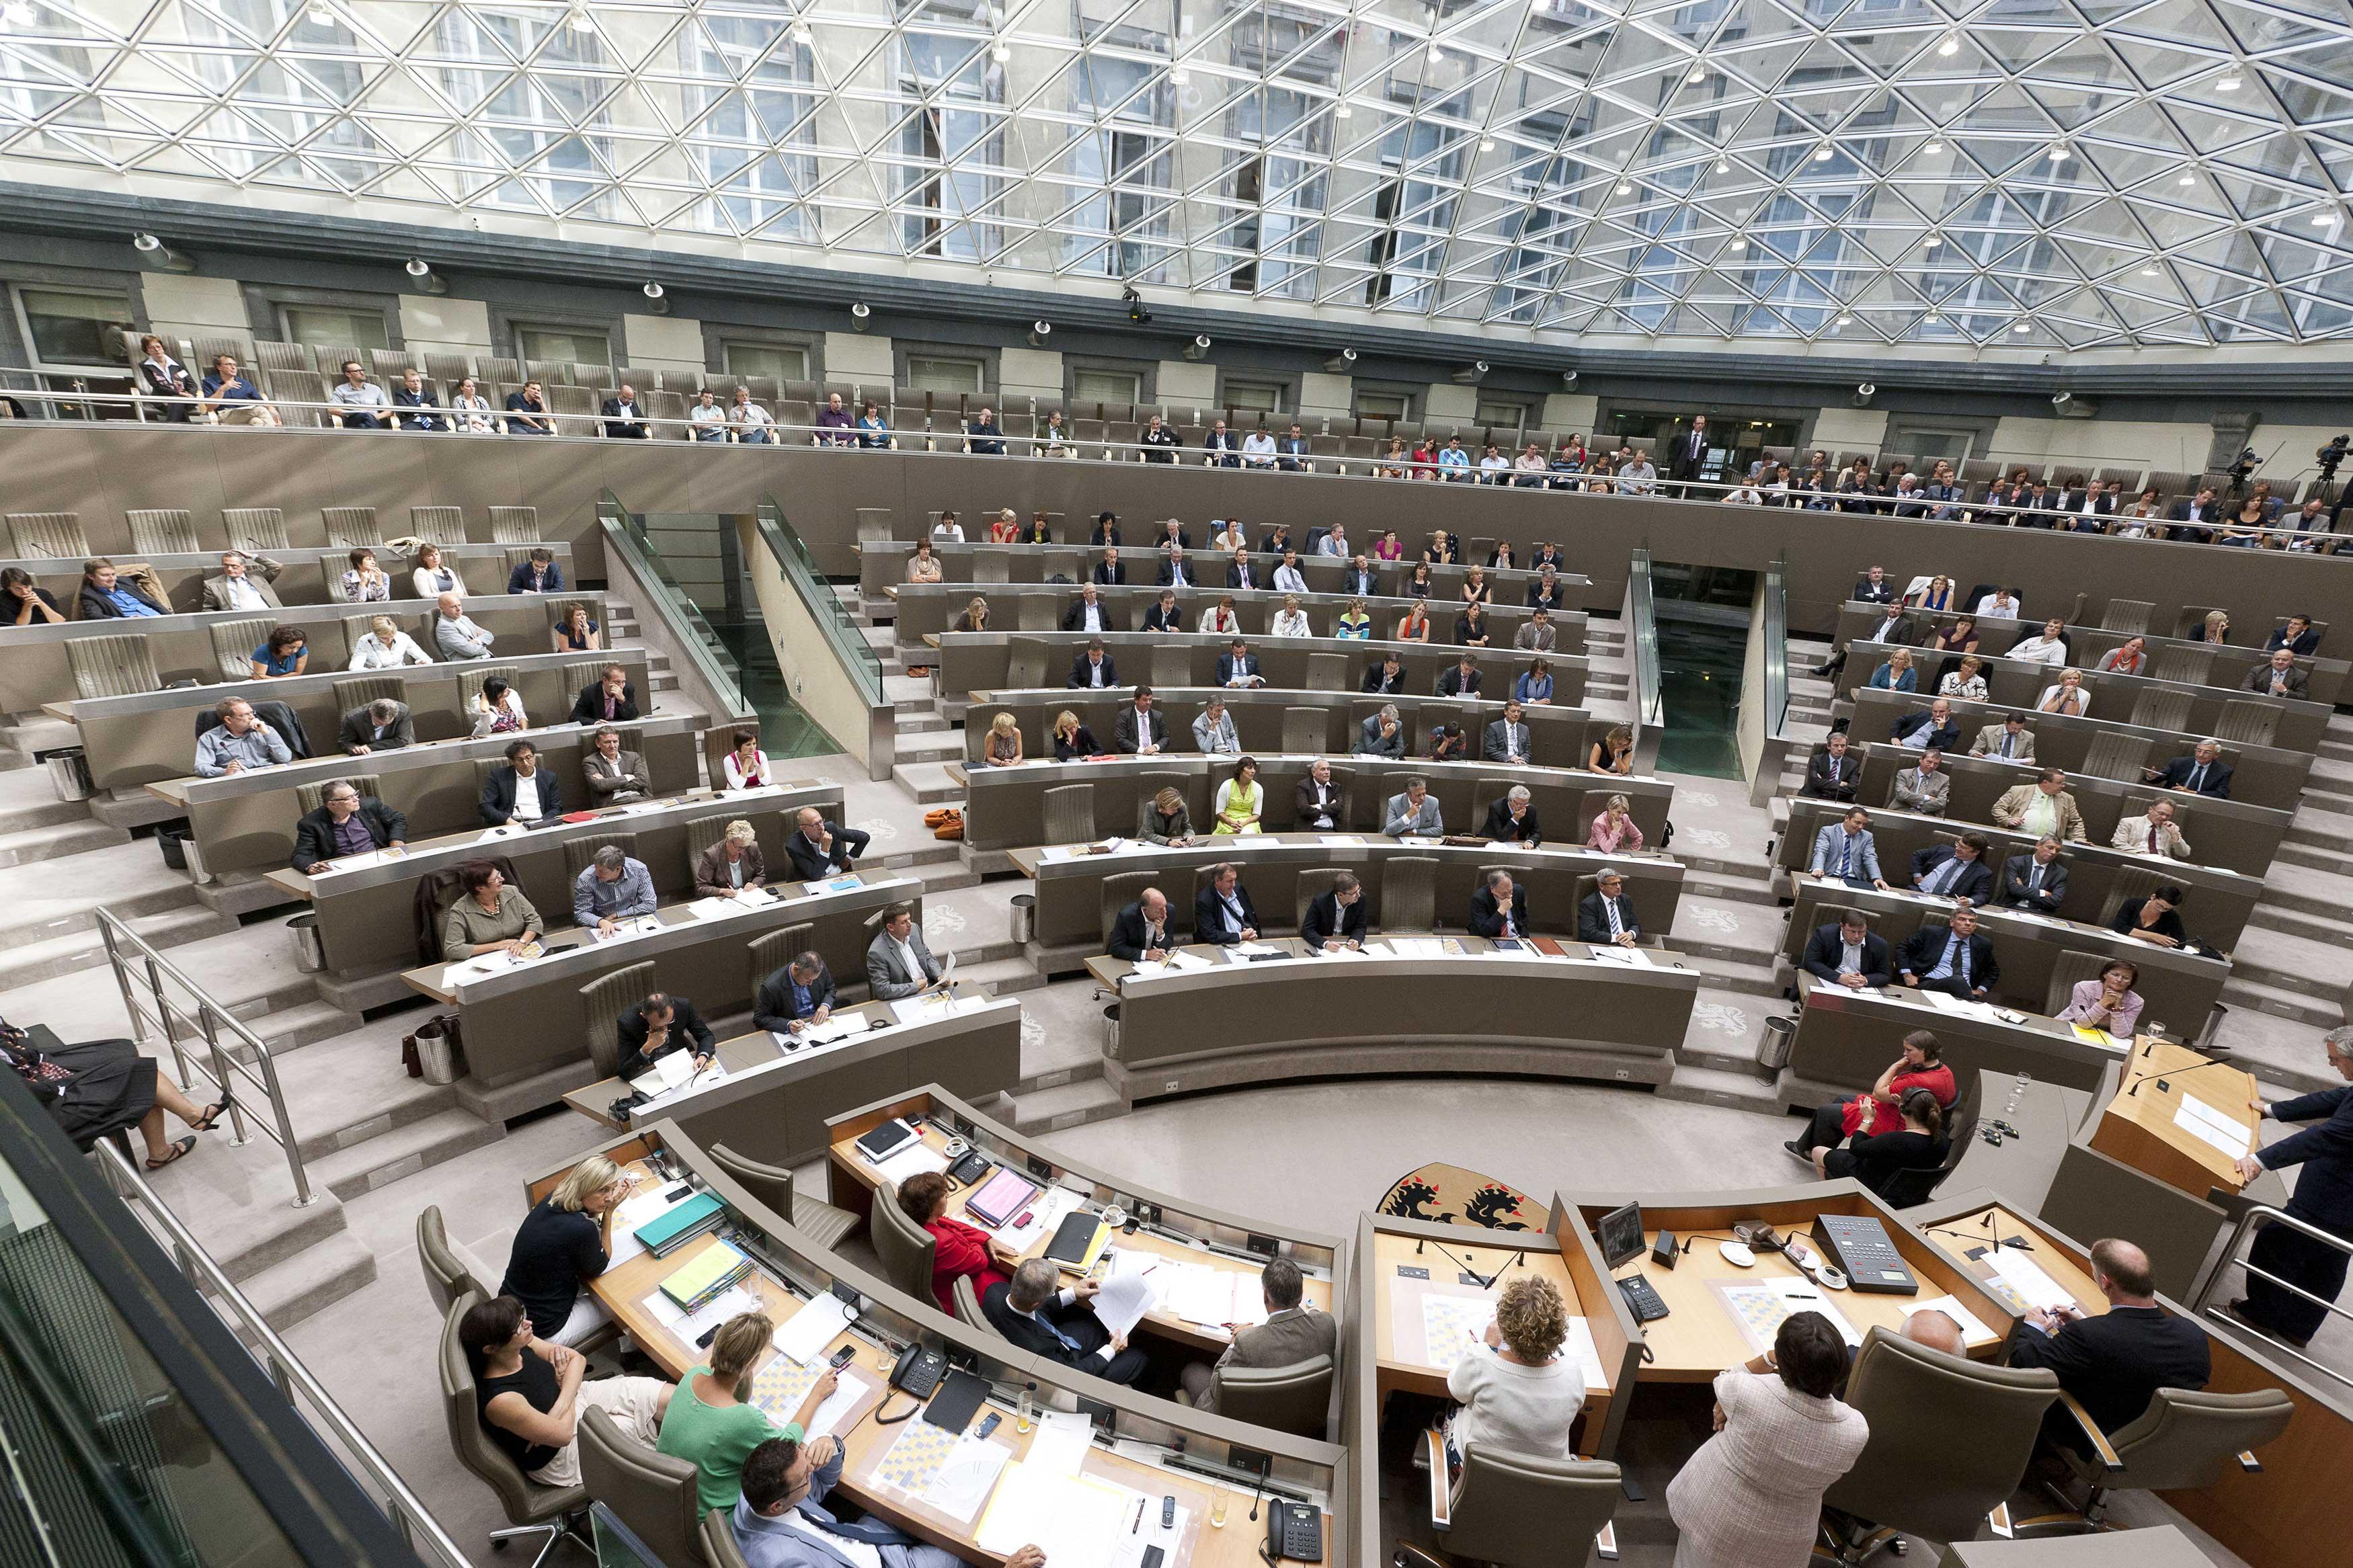 Afbeeldingsresultaat voor vlaams parlement brussel